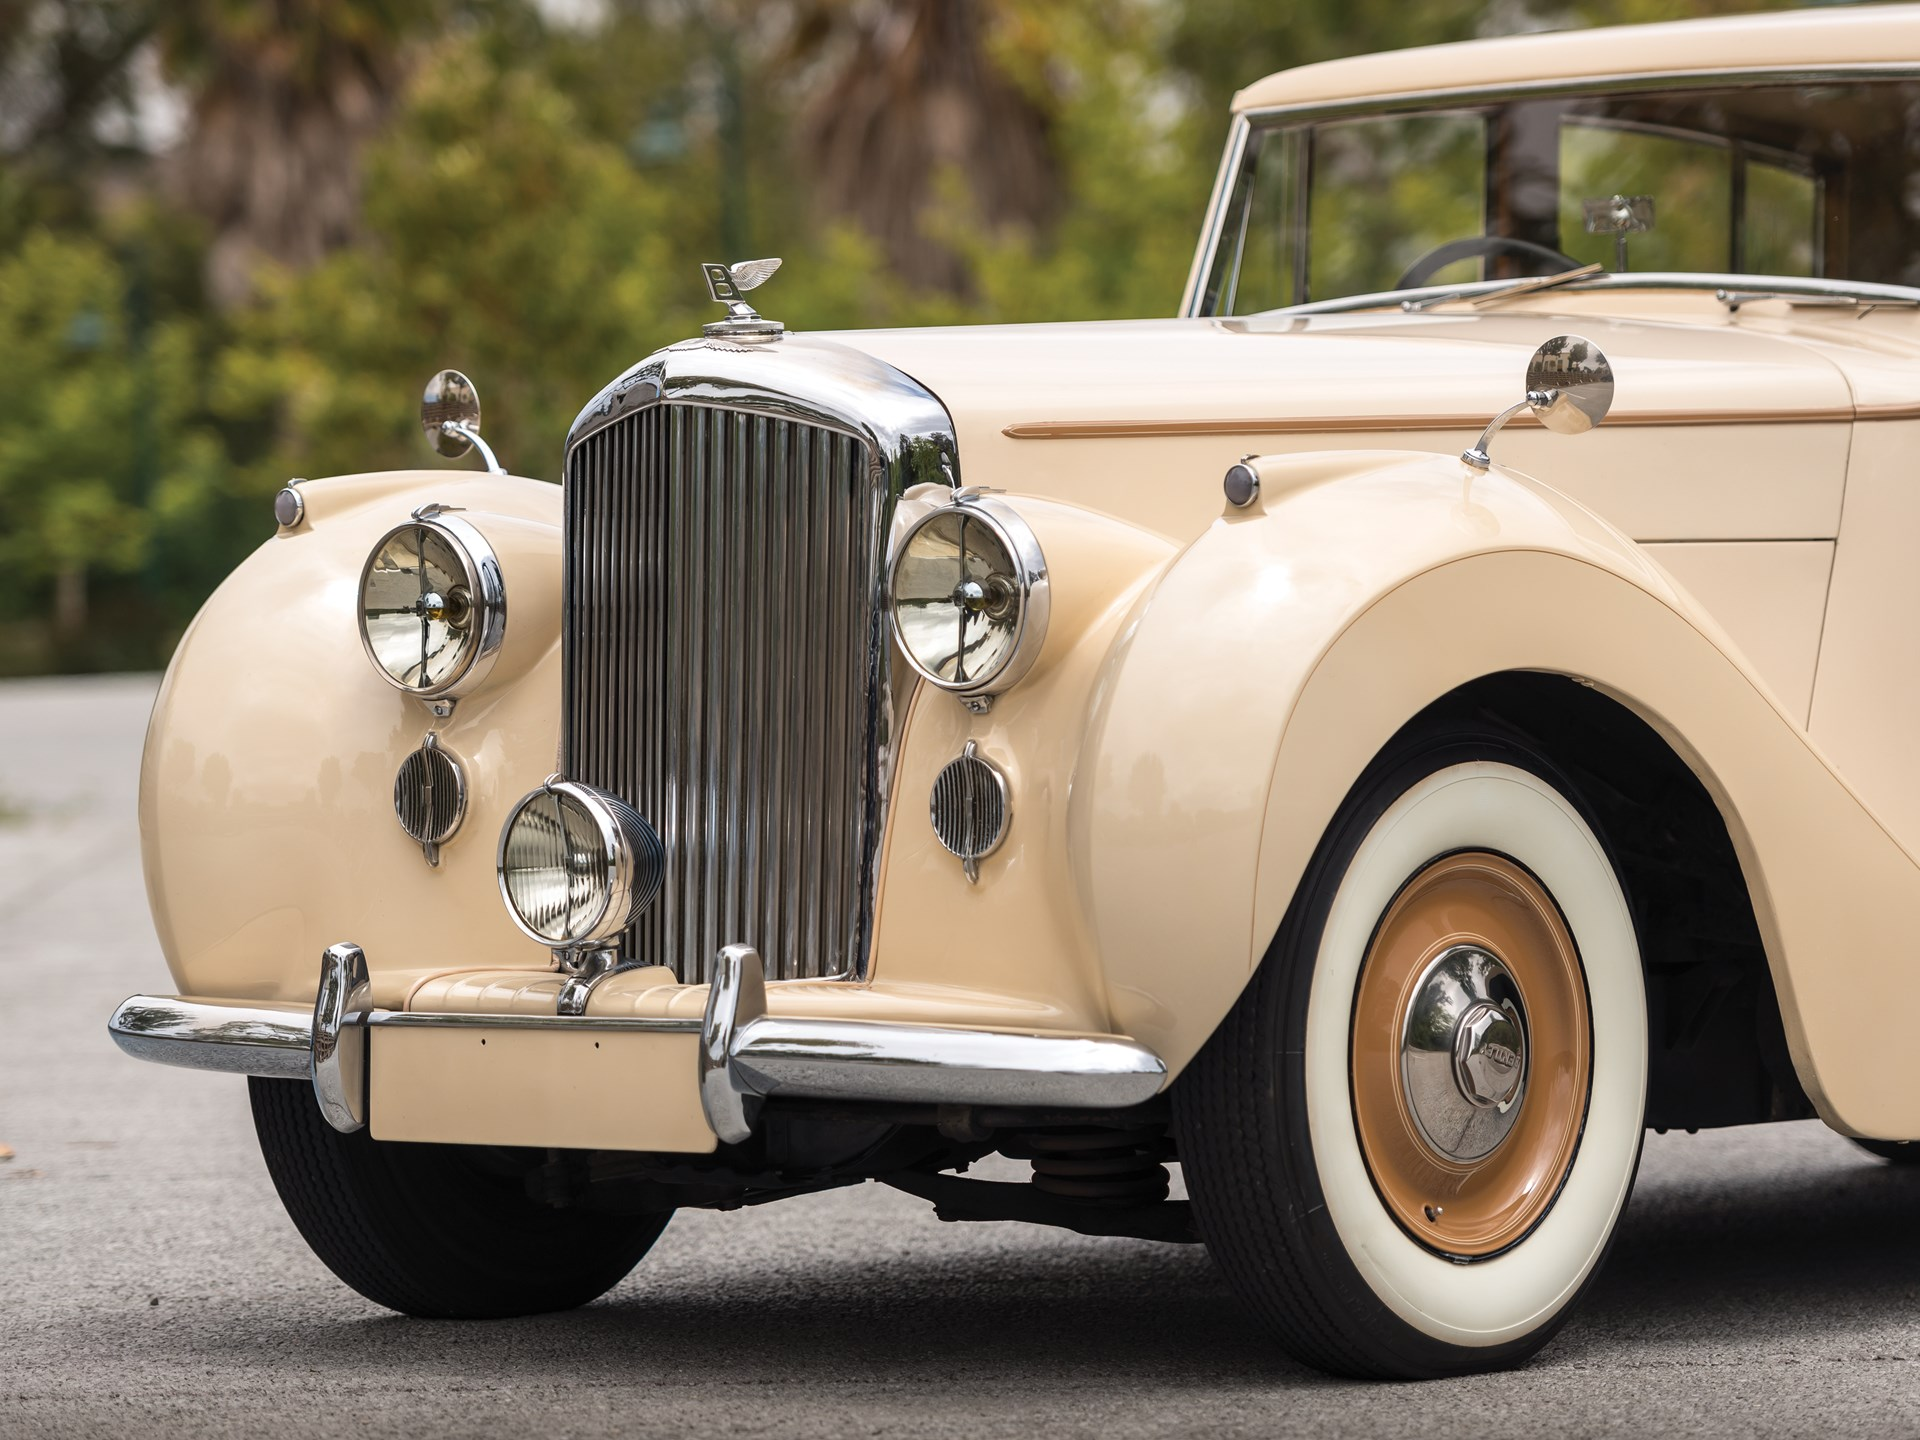 RM Sotheby's - 1947 Bentley Mark VI Saloon by Freestone